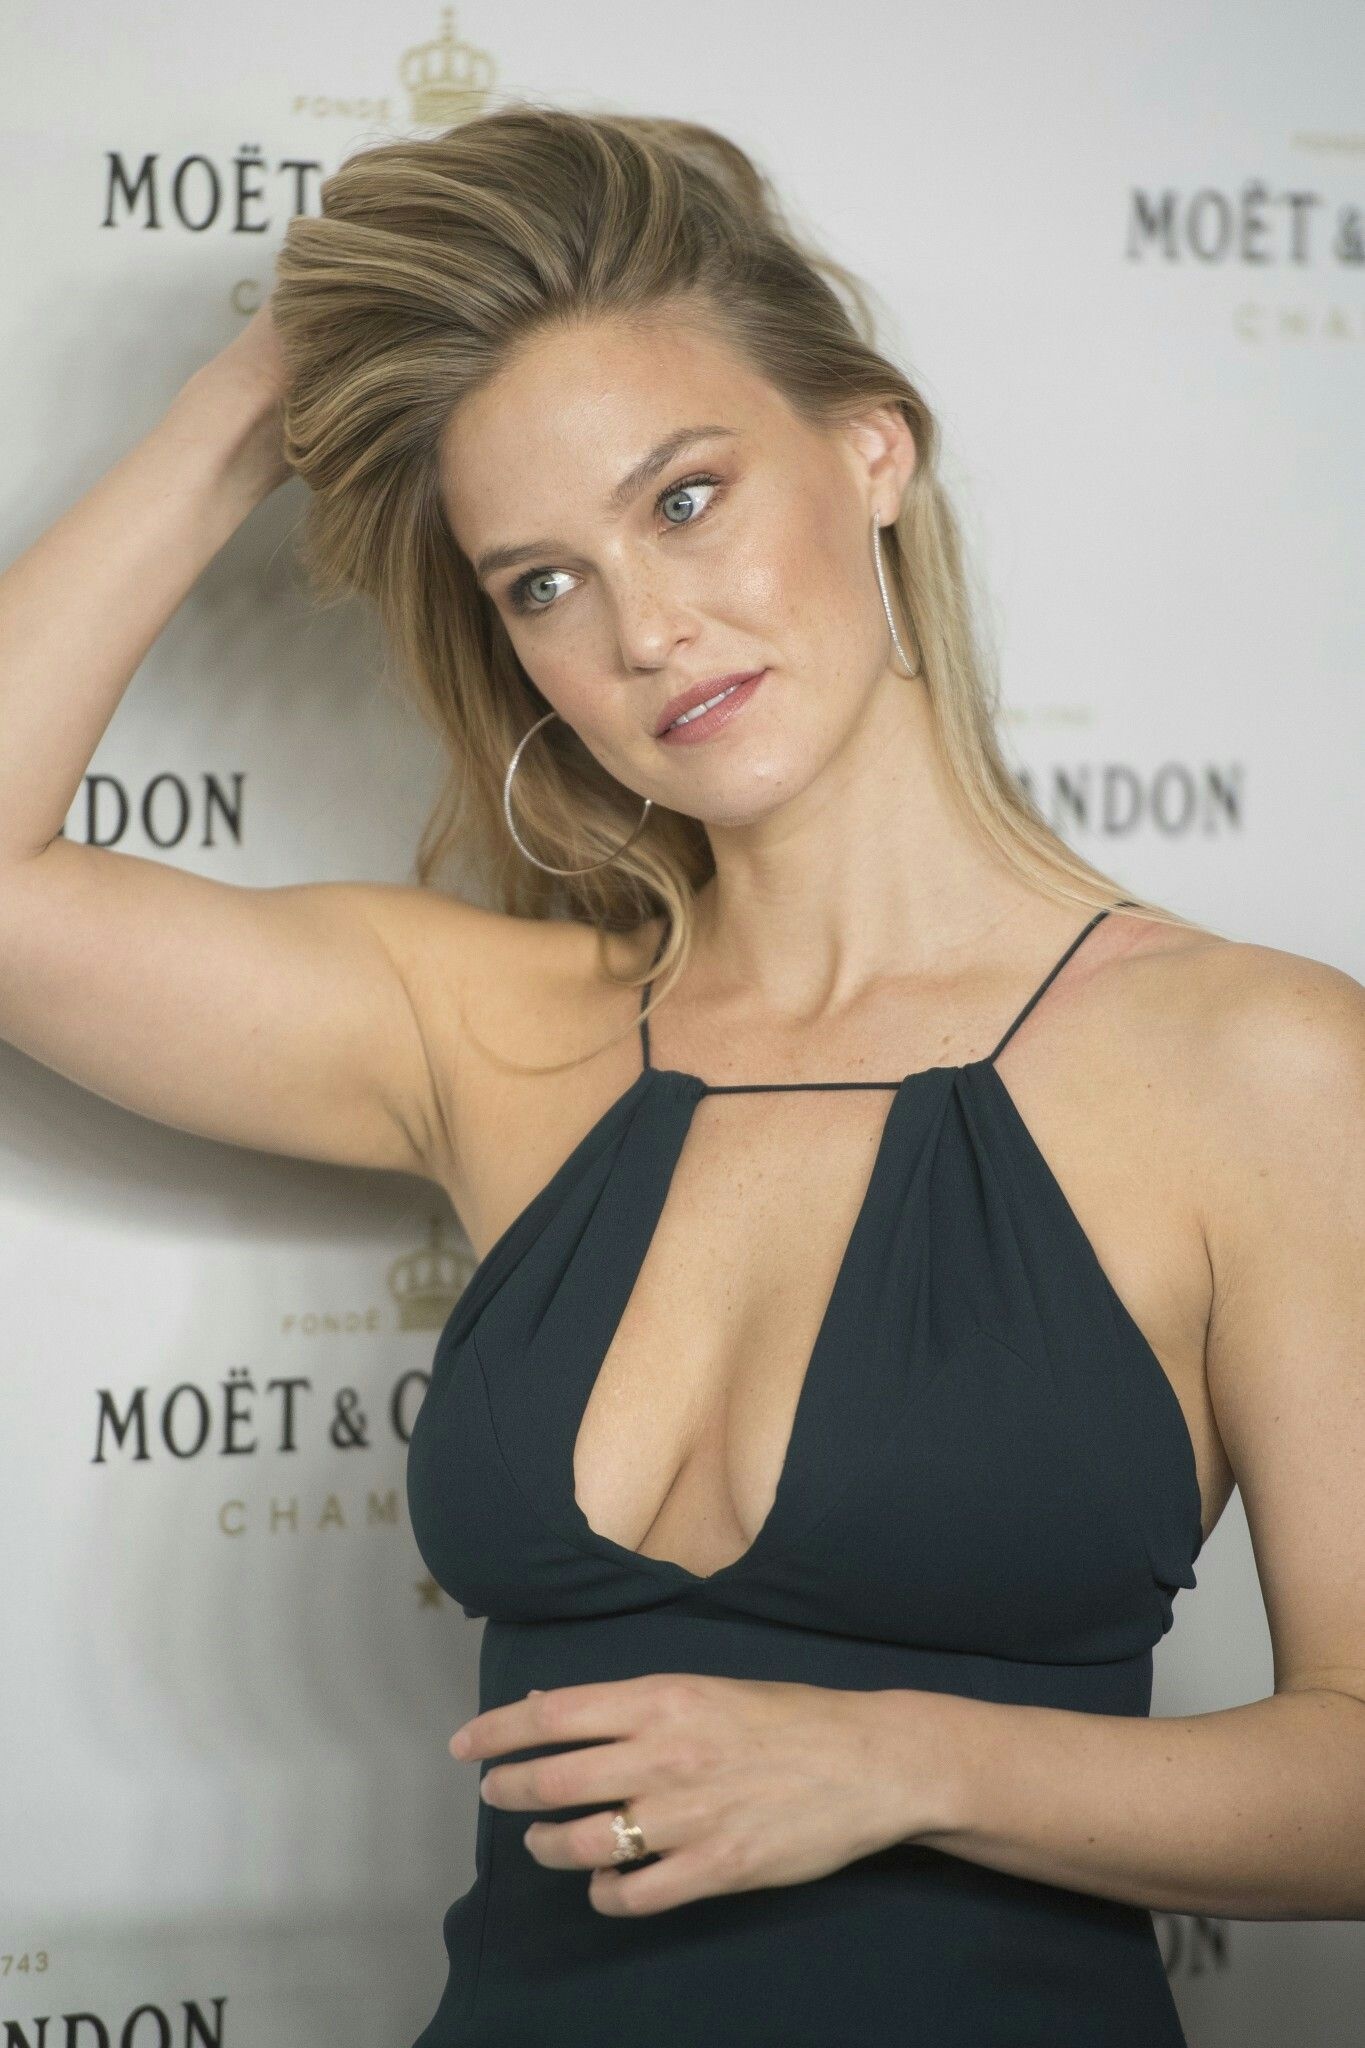 Cleavage Bar Refaeli nudes (32 photo), Tits, Bikini, Feet, butt 2019